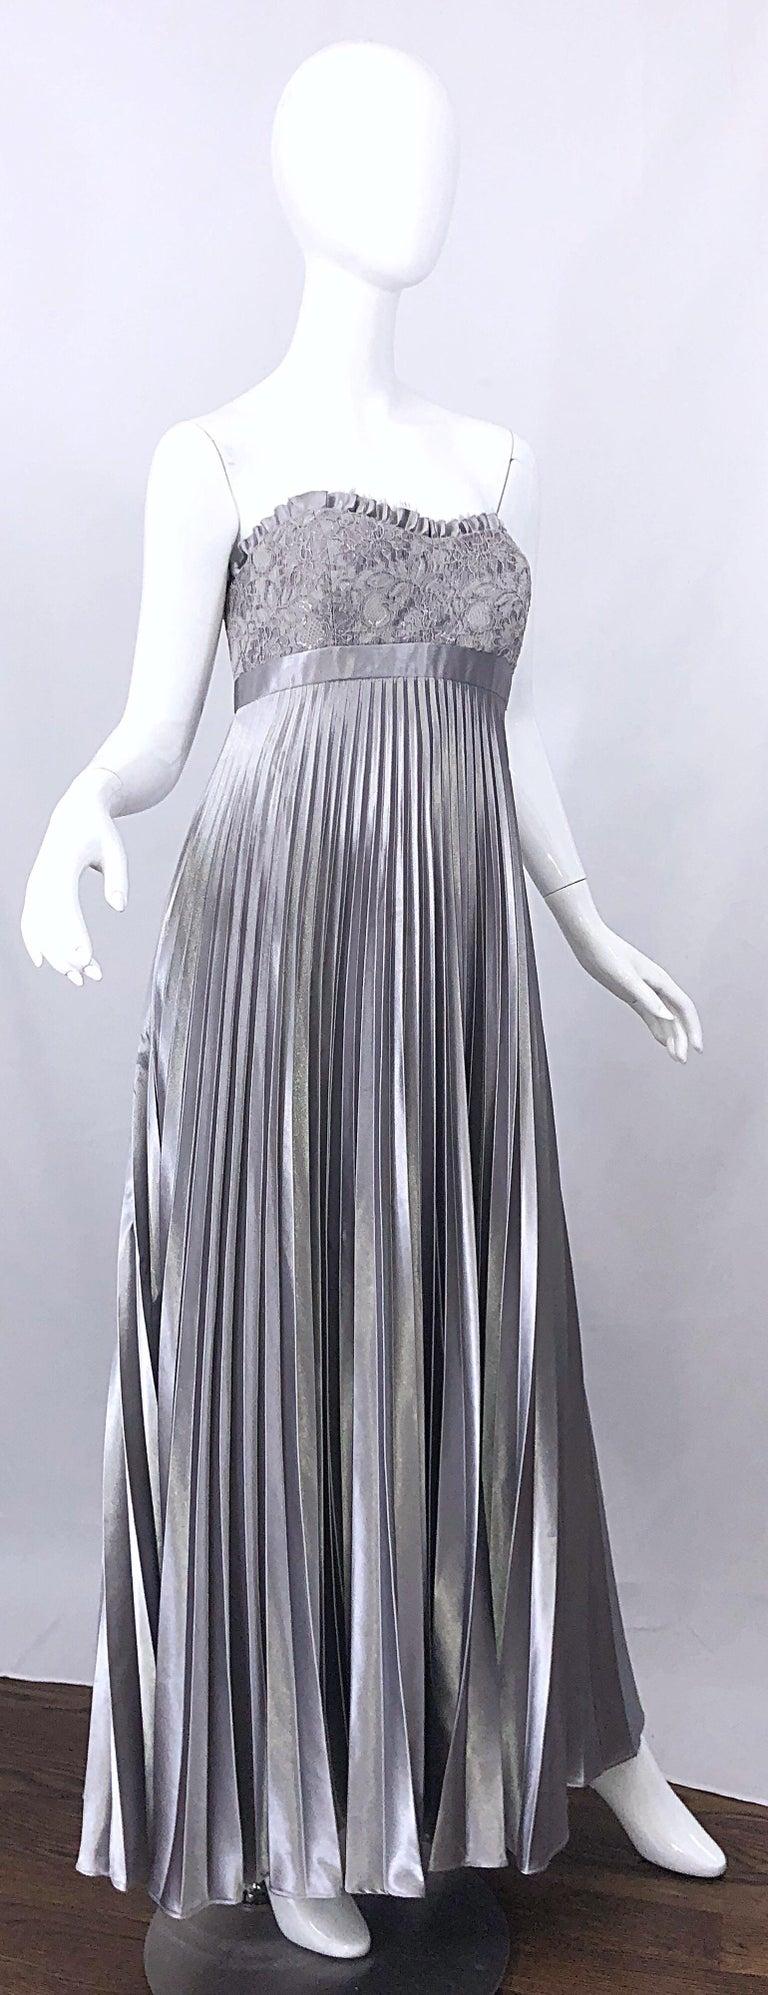 Beautiful Vintage Badgley Mischka Size 10 / 12 Silver Metallic Beaded Gown Dress For Sale 2